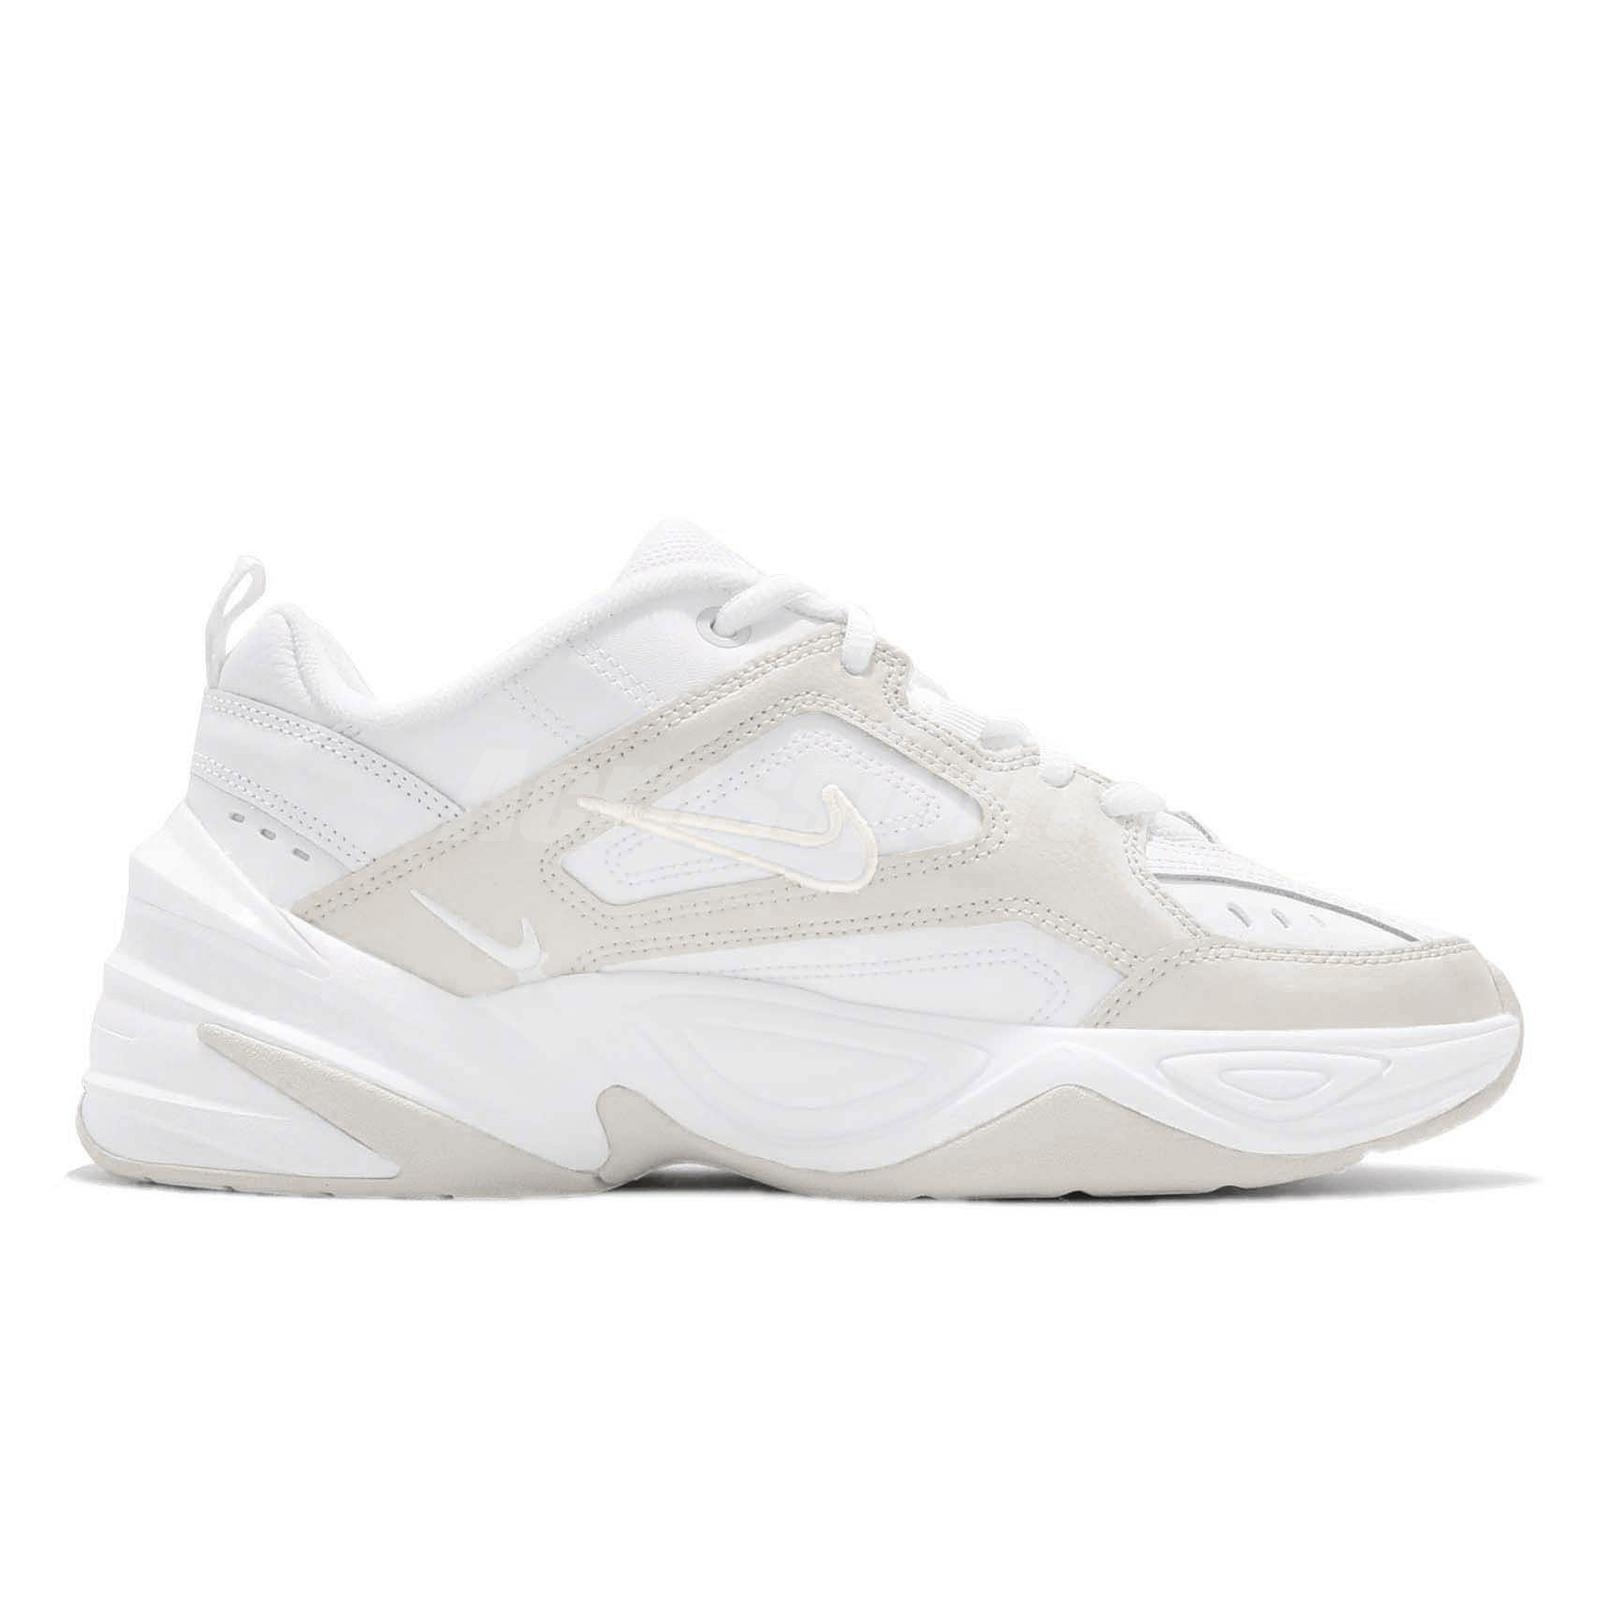 f7ffe0c480d Nike Wmns M2K Tekno Phantom White Women Casual Daddy Shoes Sneakers ...